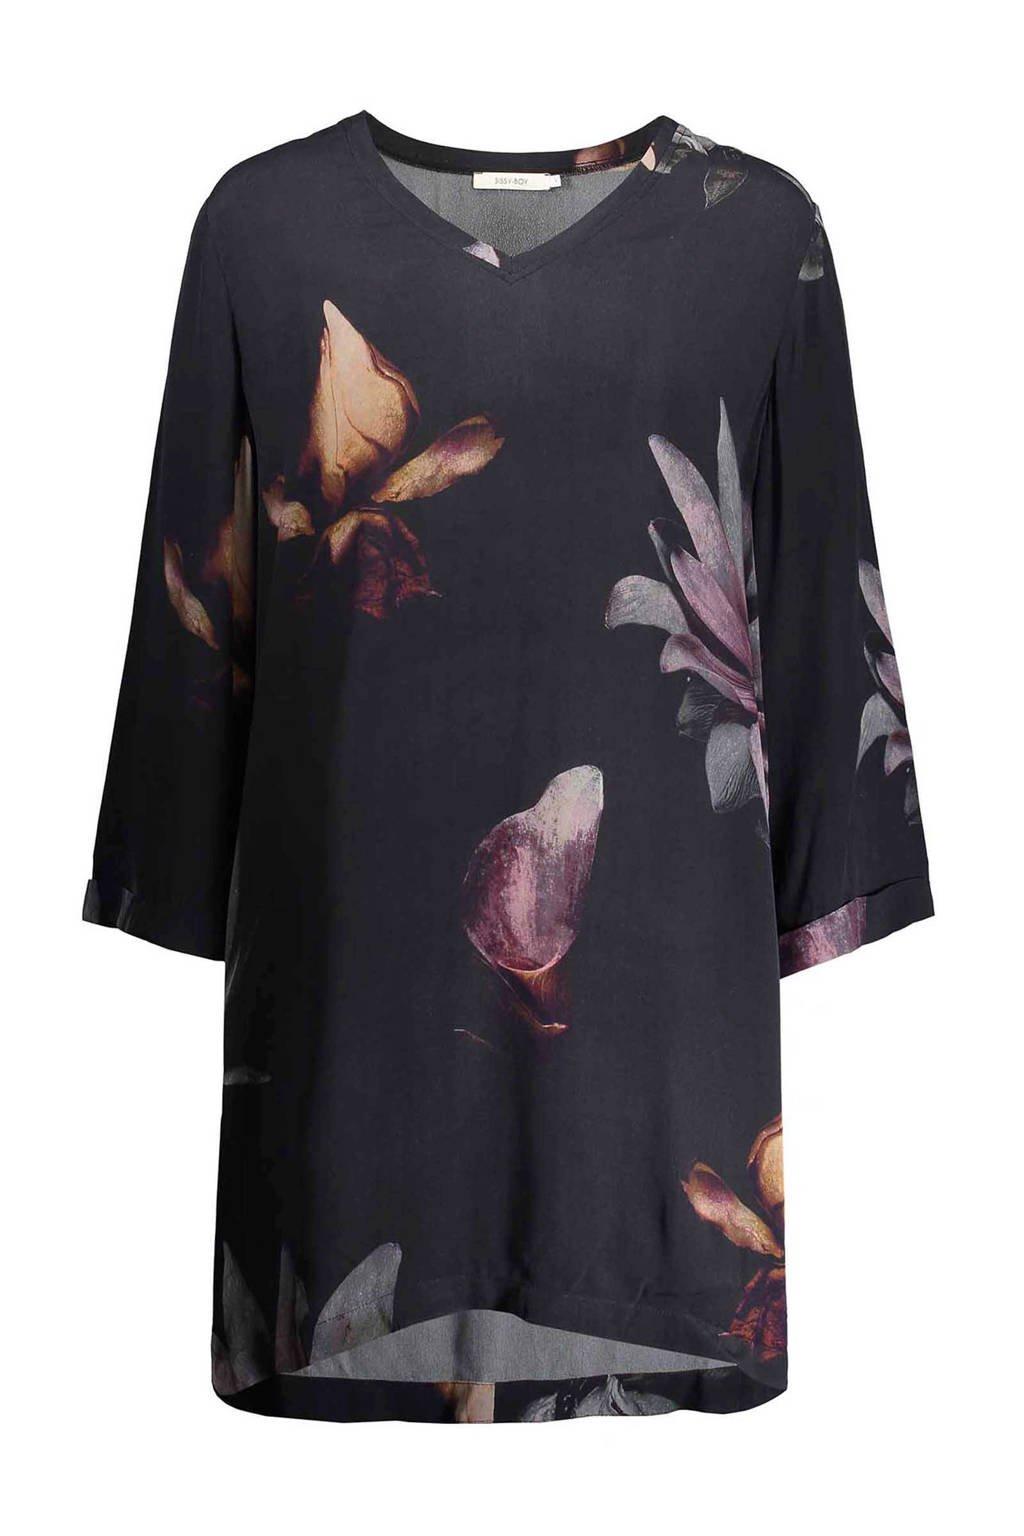 Sissy-Boy jurk, Zwart/paars/oranje